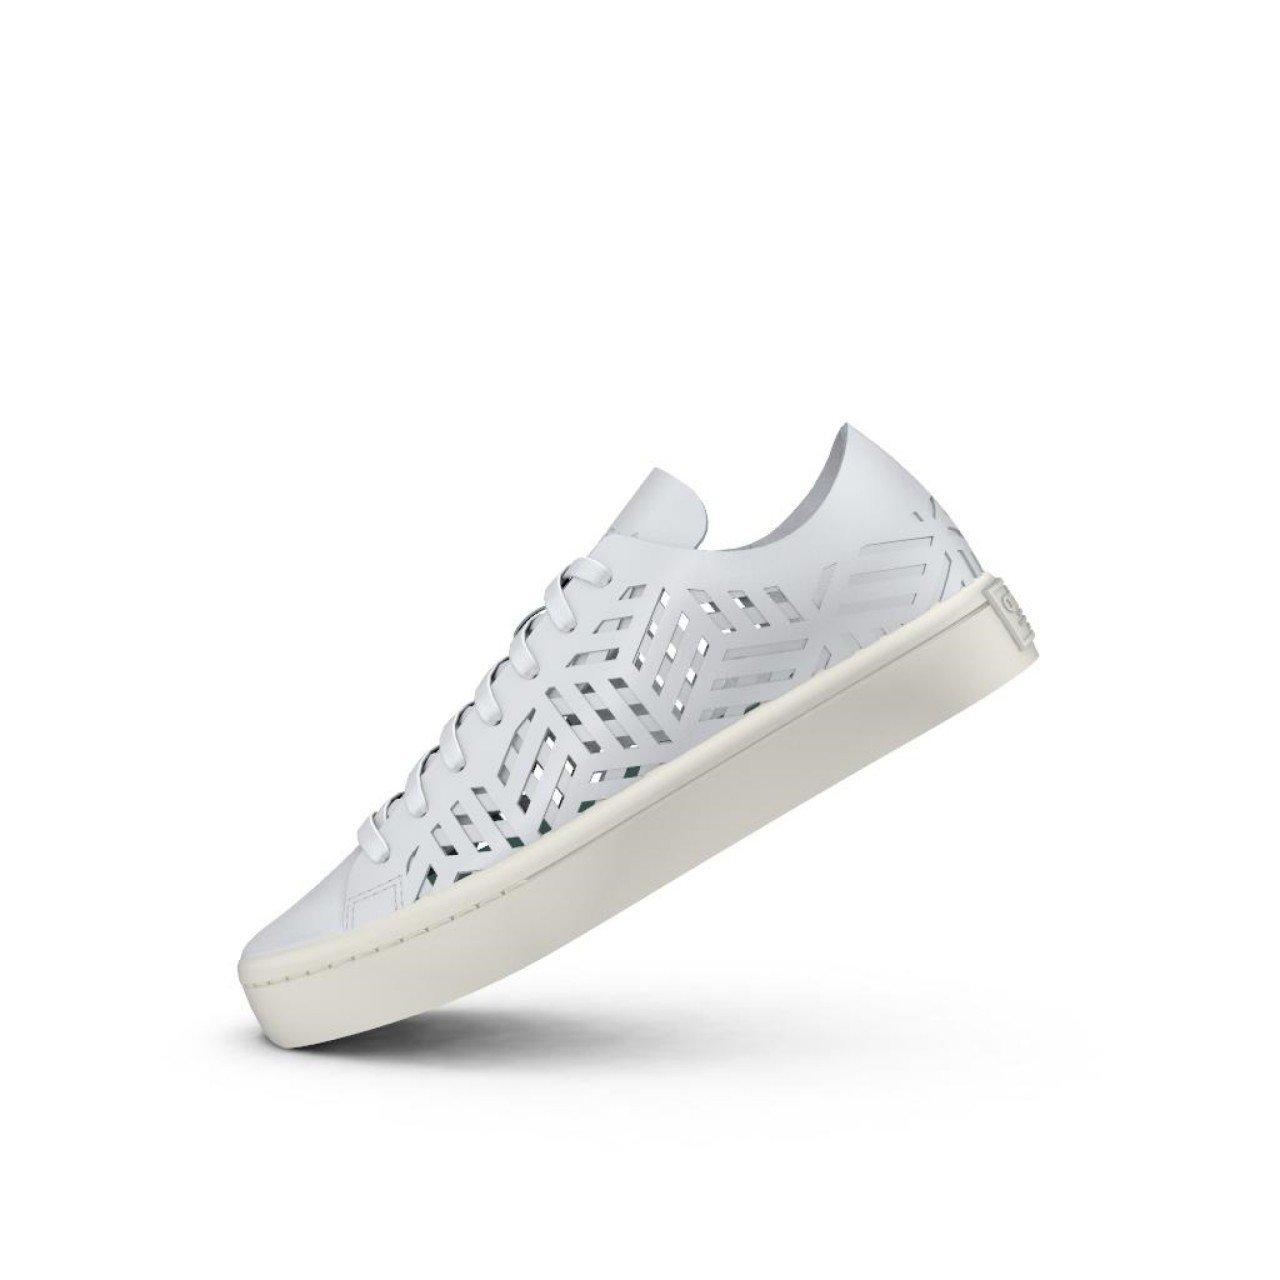 Adidas Women's Courtvantage W Leather Sneakers